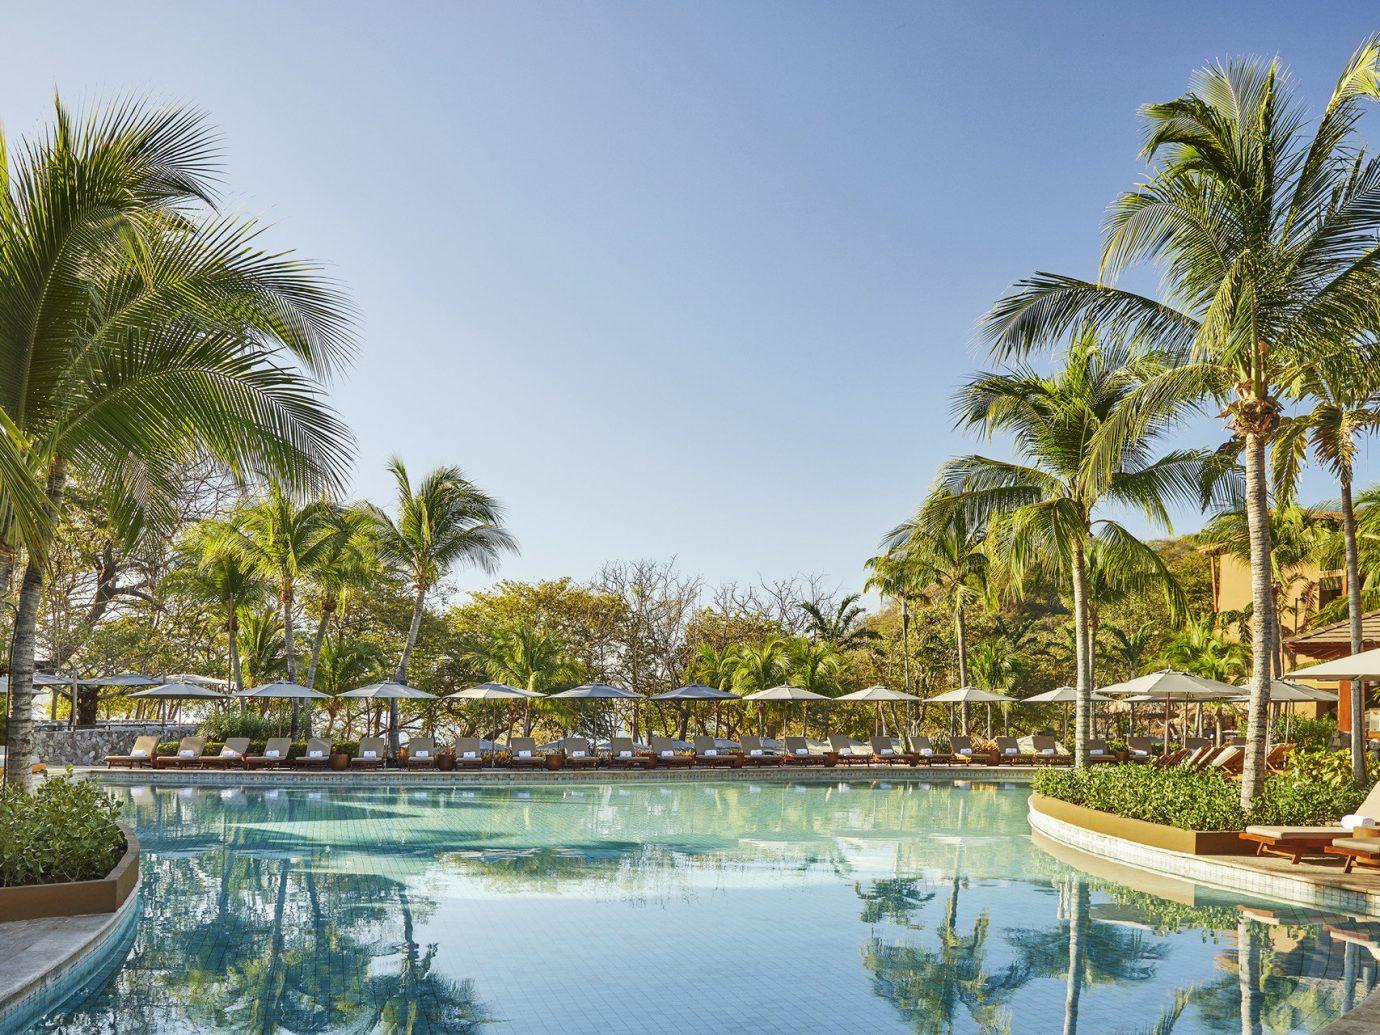 Pool at the Four Seasons resort in Costa Rica